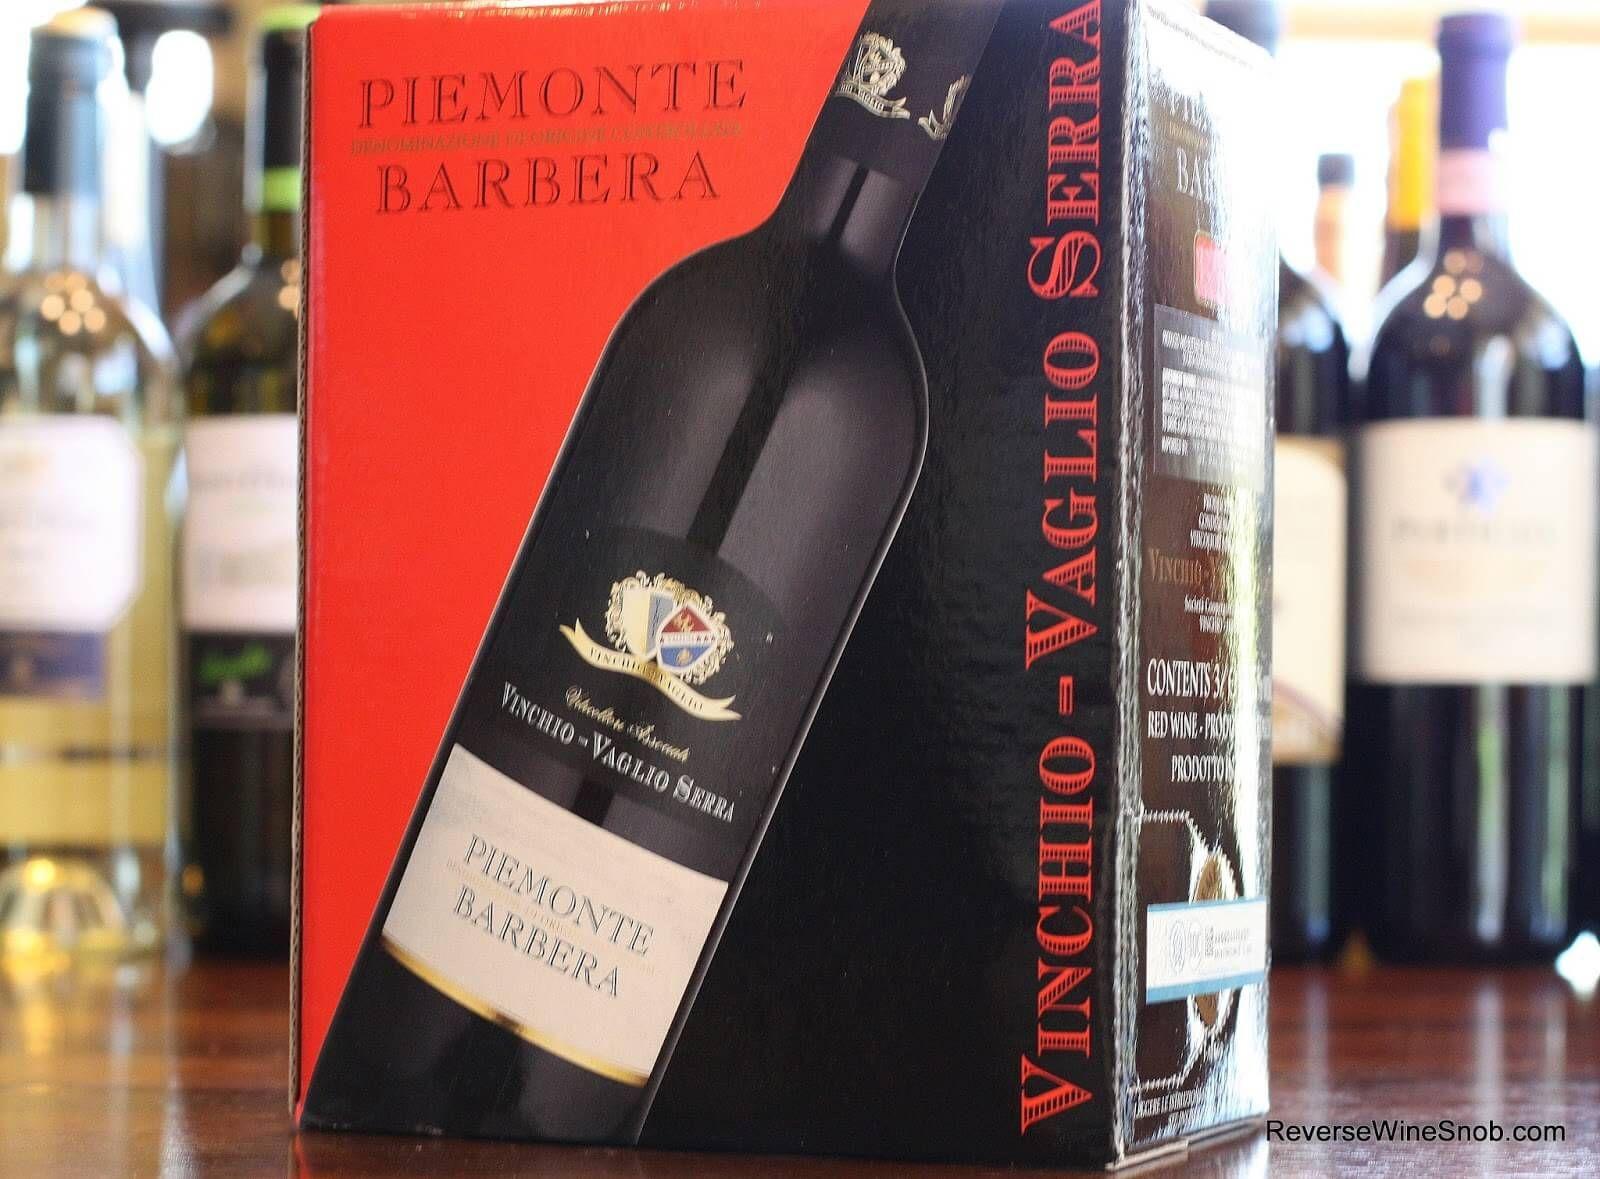 The Best Box Wines Vinchio Vaglio Serra Piemonte Barbera 2012 Wine Snob Wine Wine Box